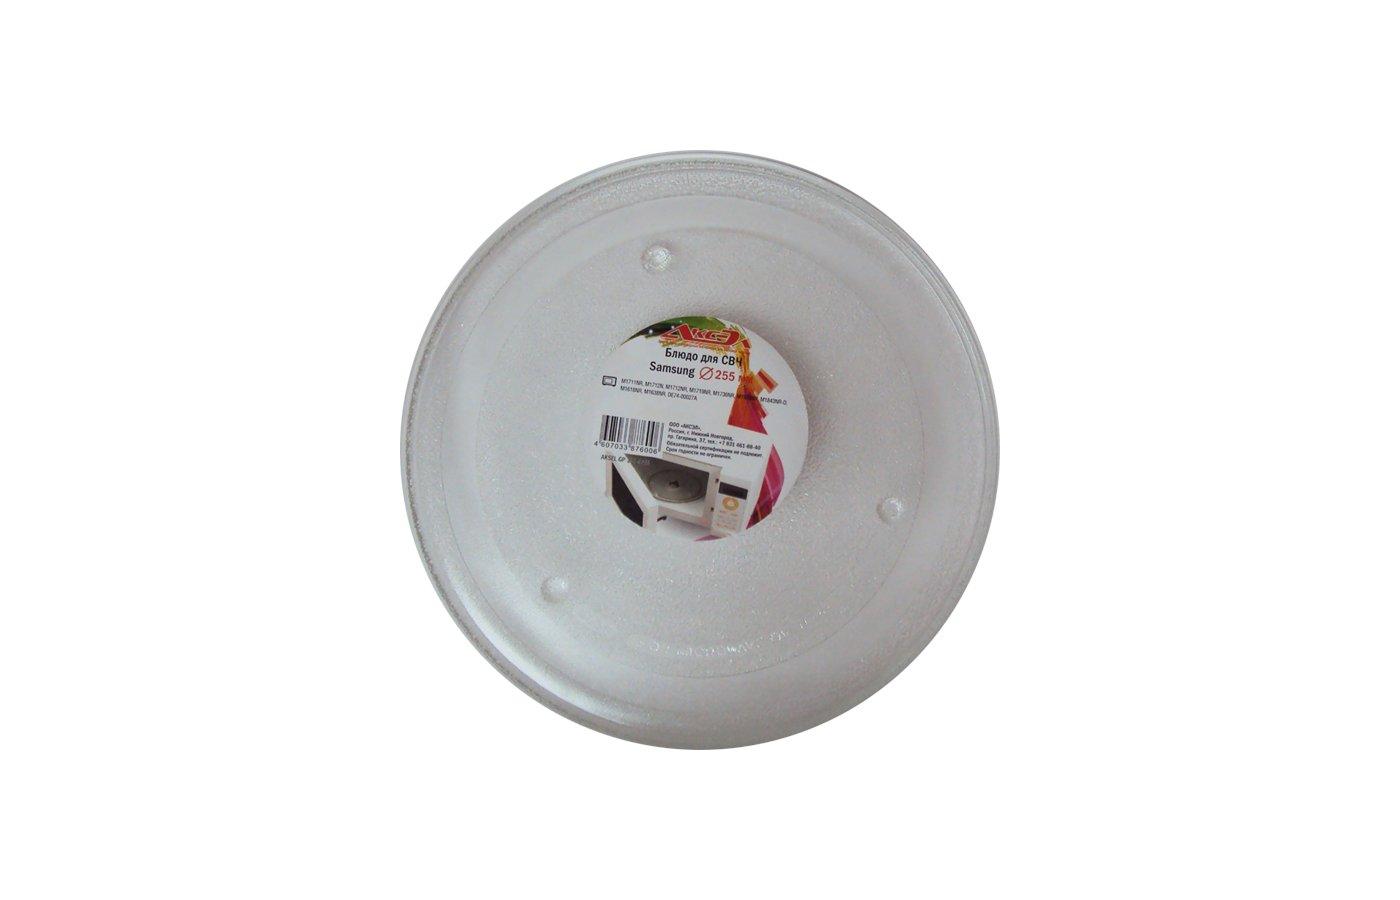 Тарелка для СВЧ AKSEL/EURO EUR N-08 Тарелка для СВЧ GP-255-SAM